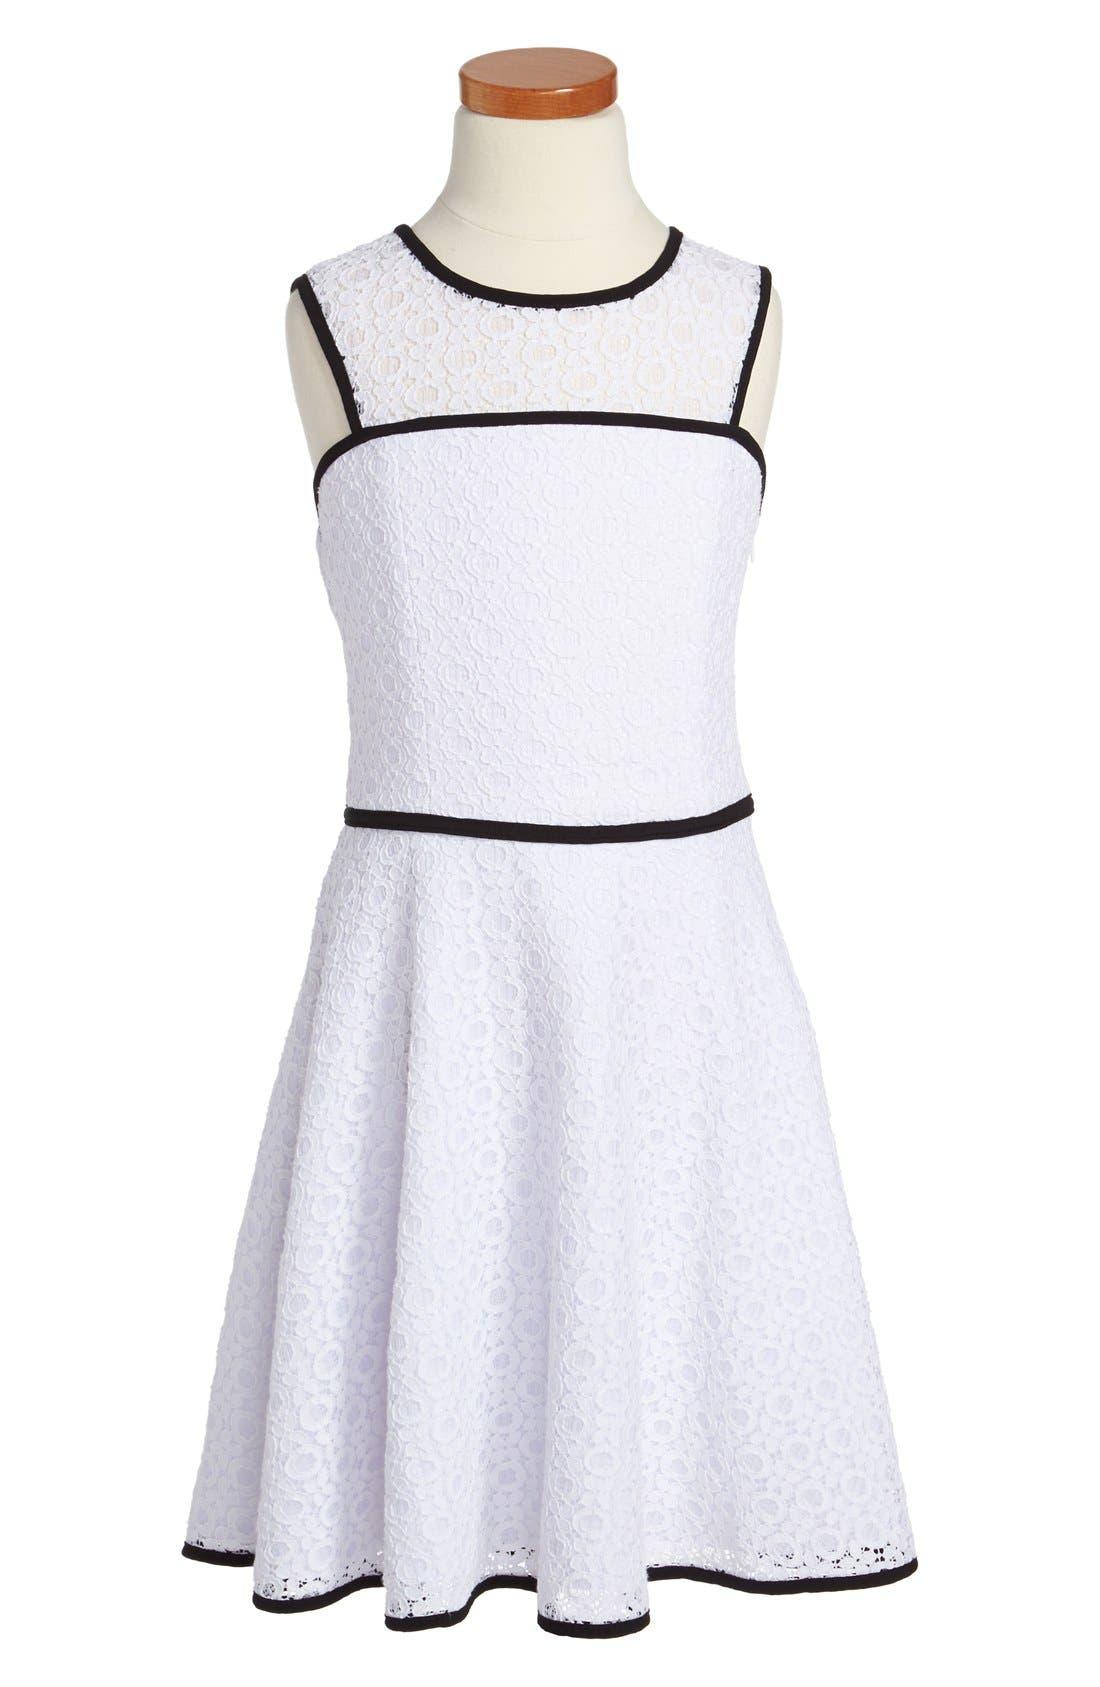 Alternate Image 1 Selected - Sally Miller 'XO' Lace Dress (Big Girls)